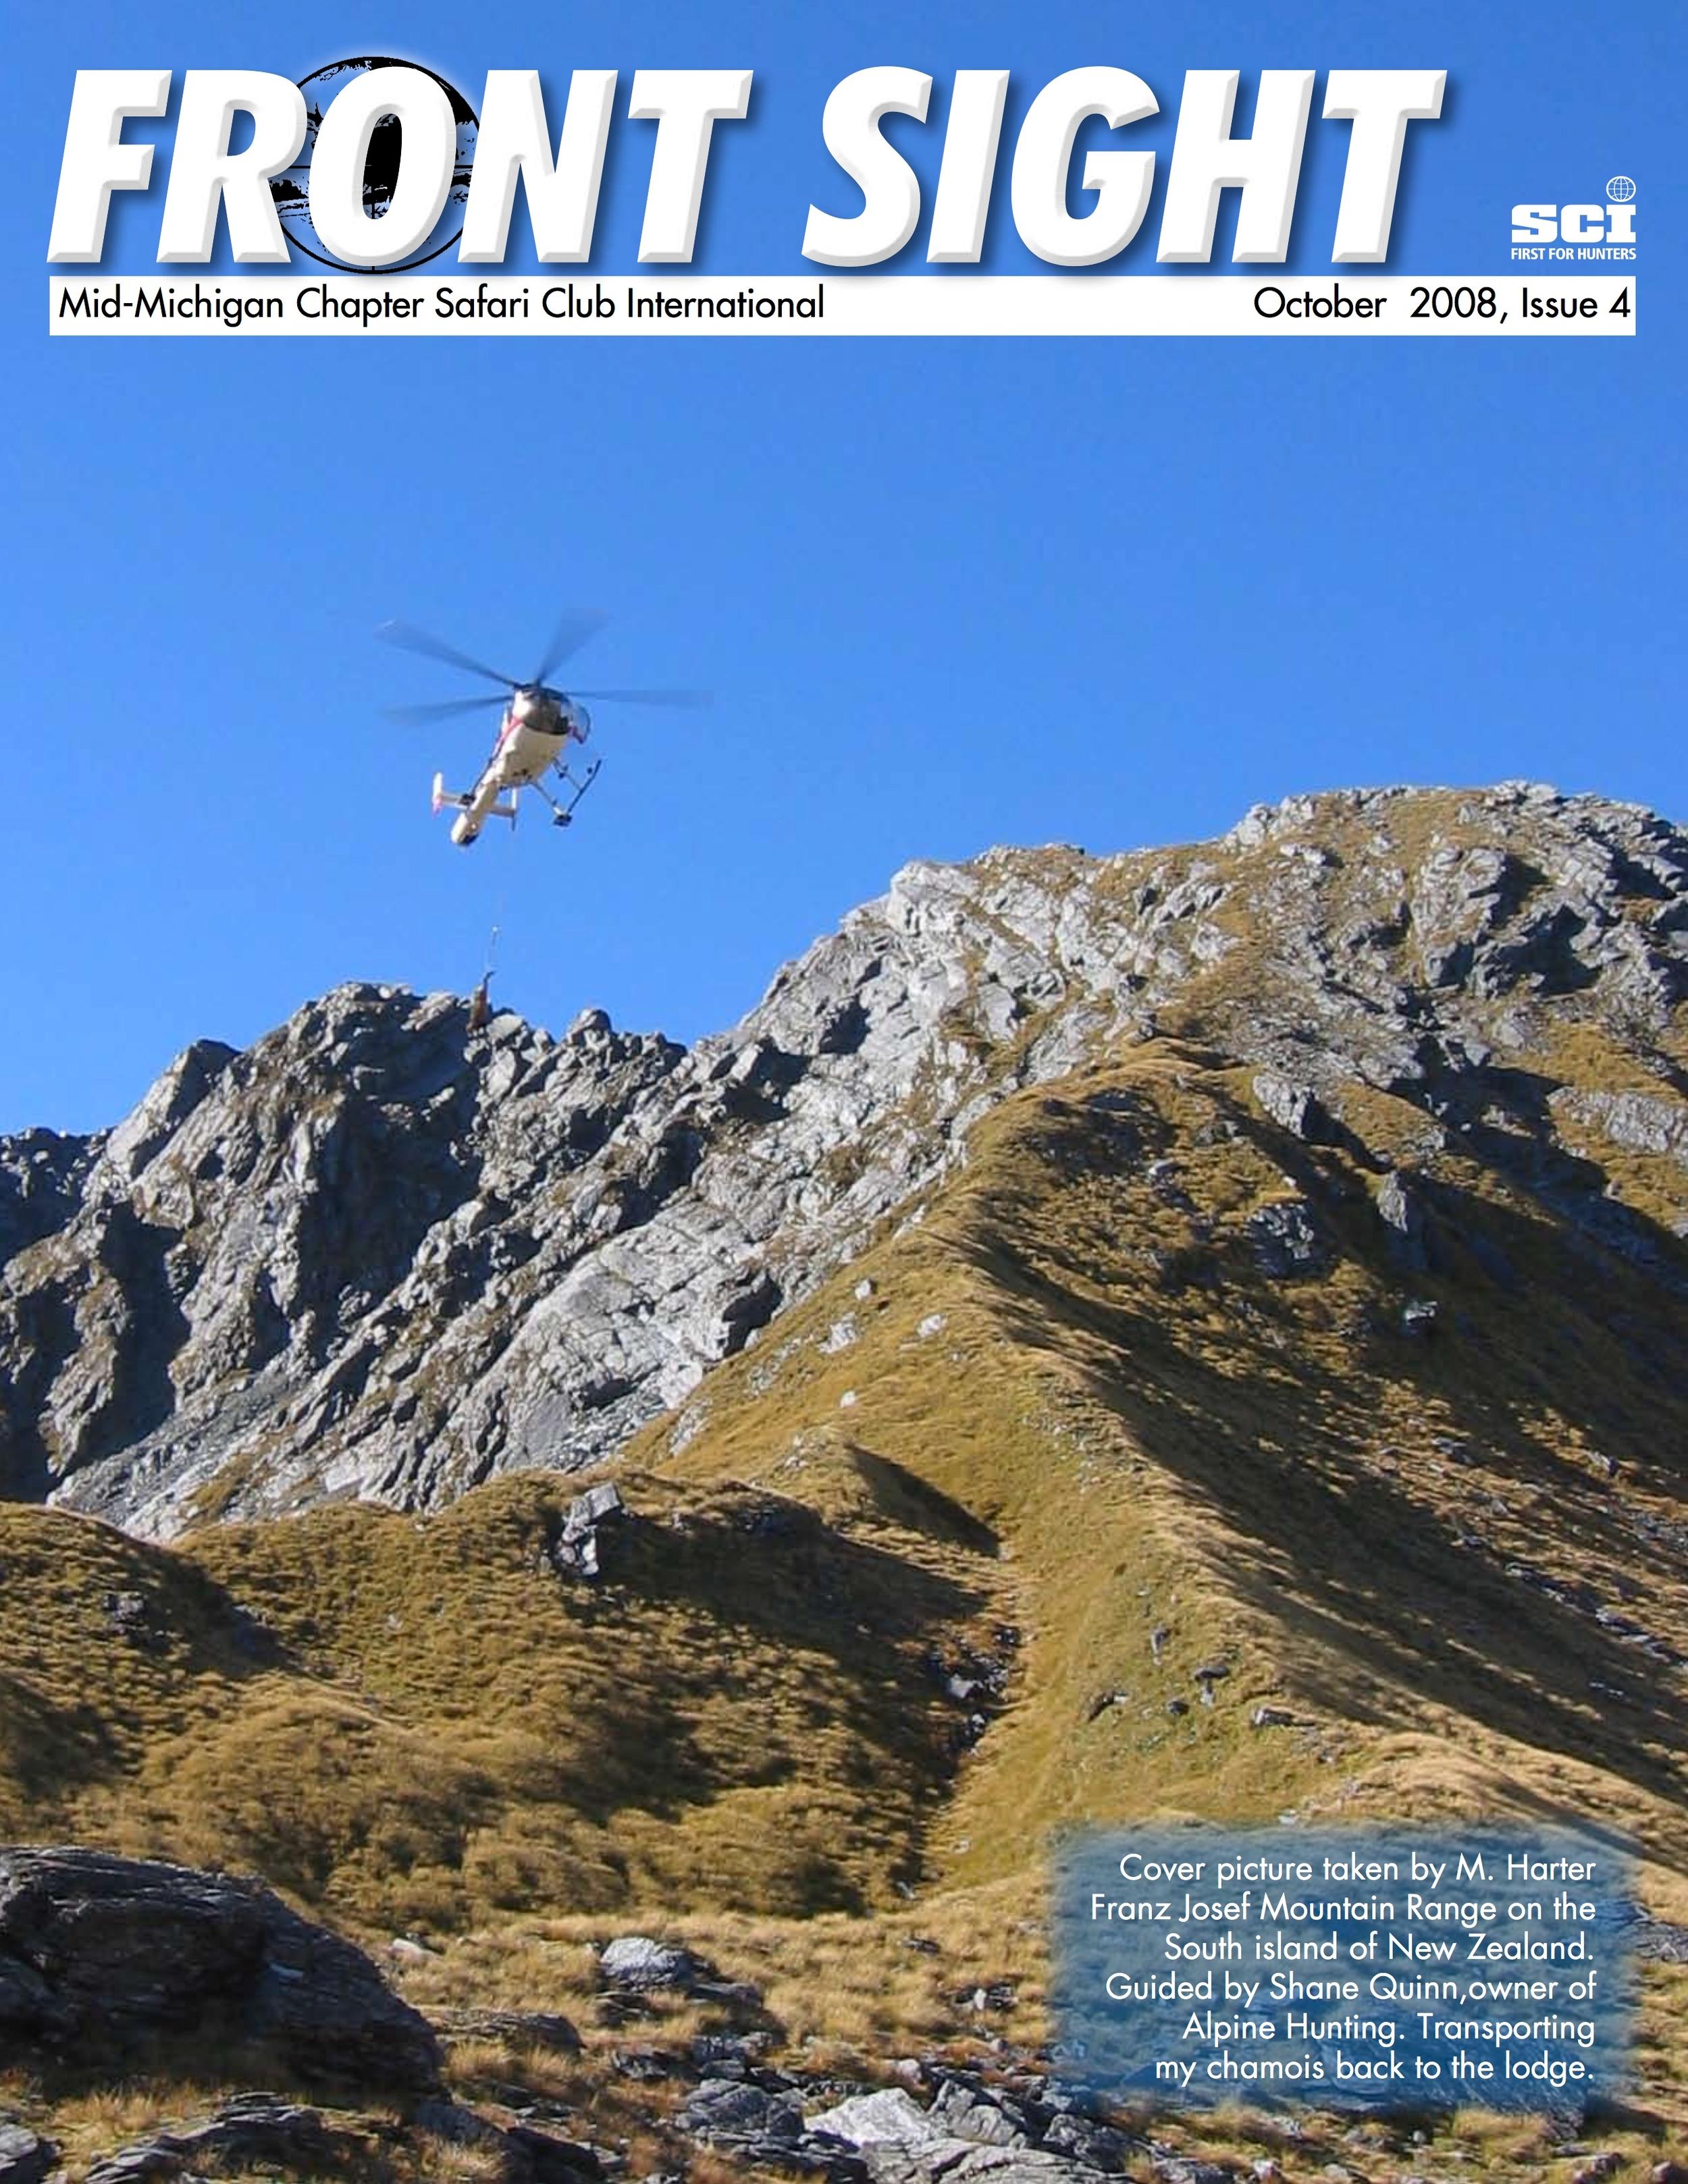 Issue 4, October 2008